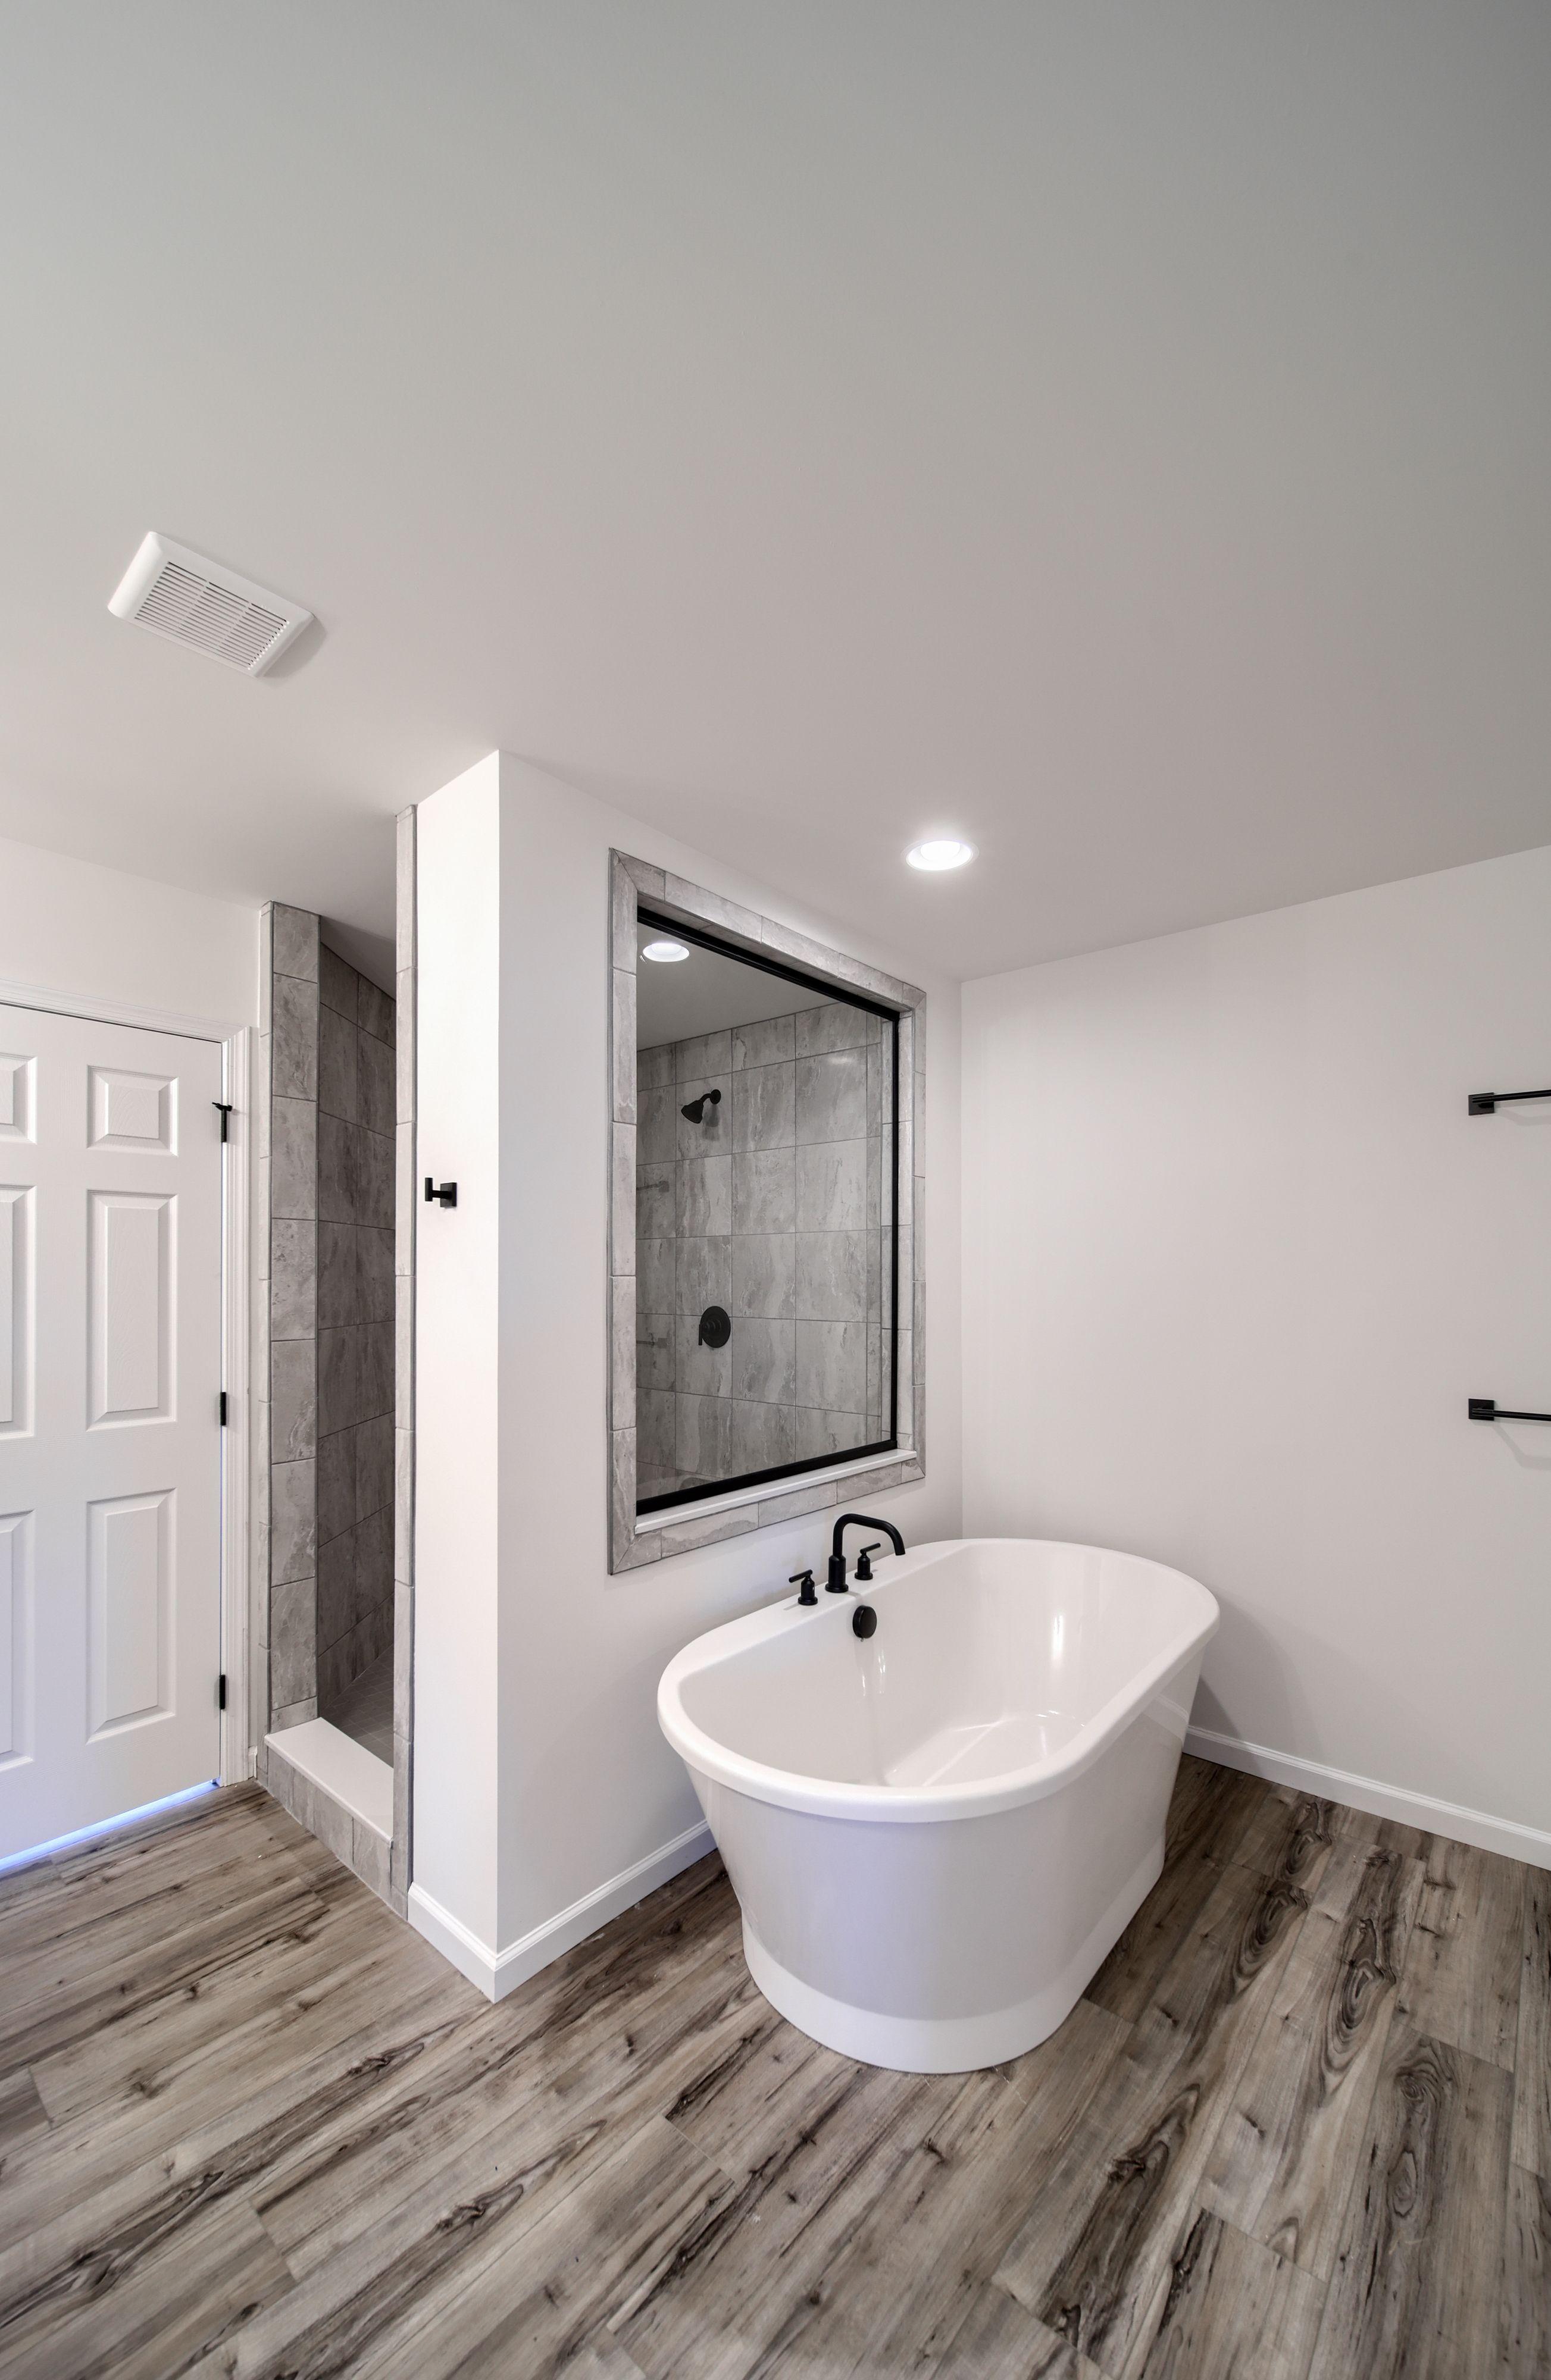 Bathroom featured in the Oxford Farmhouse By Keystone Custom Homes in Harrisburg, PA